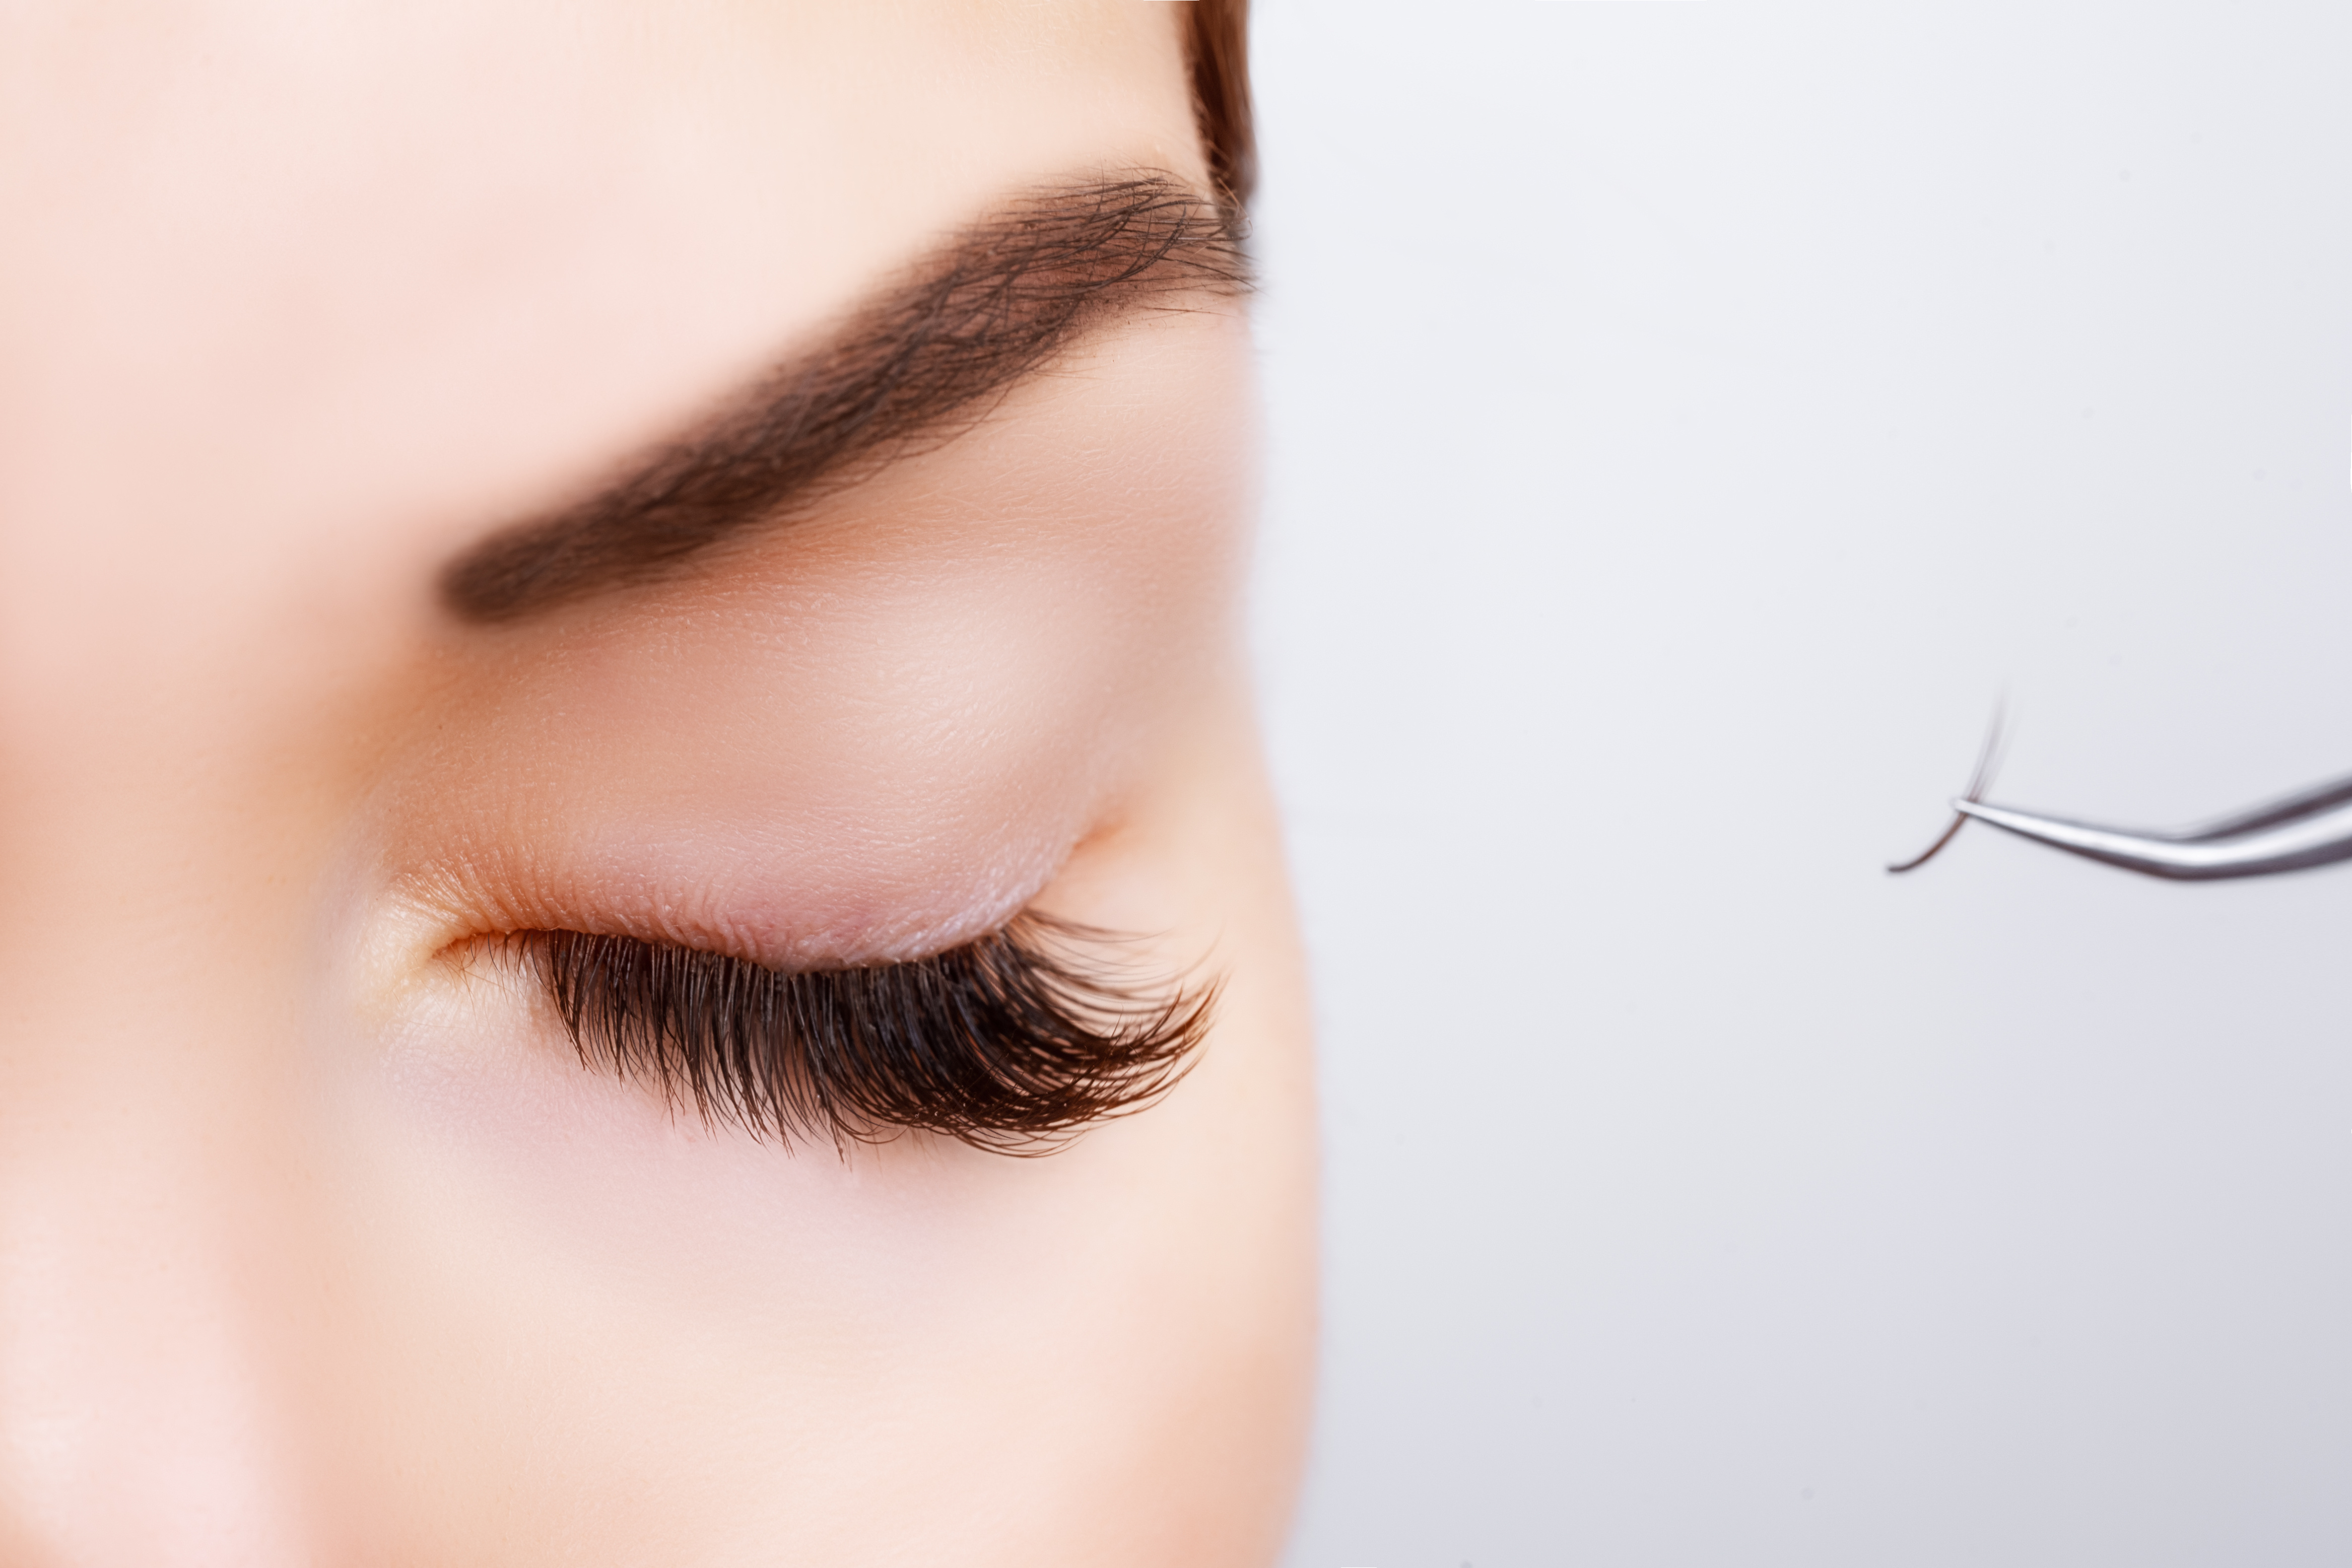 https://0901.nccdn.net/4_2/000/000/06c/bba/Canva---Woman-Eye-with-Long-Eyelashes.-Eyelash-Extension.-Lashes--close-up--4669x3113.jpg